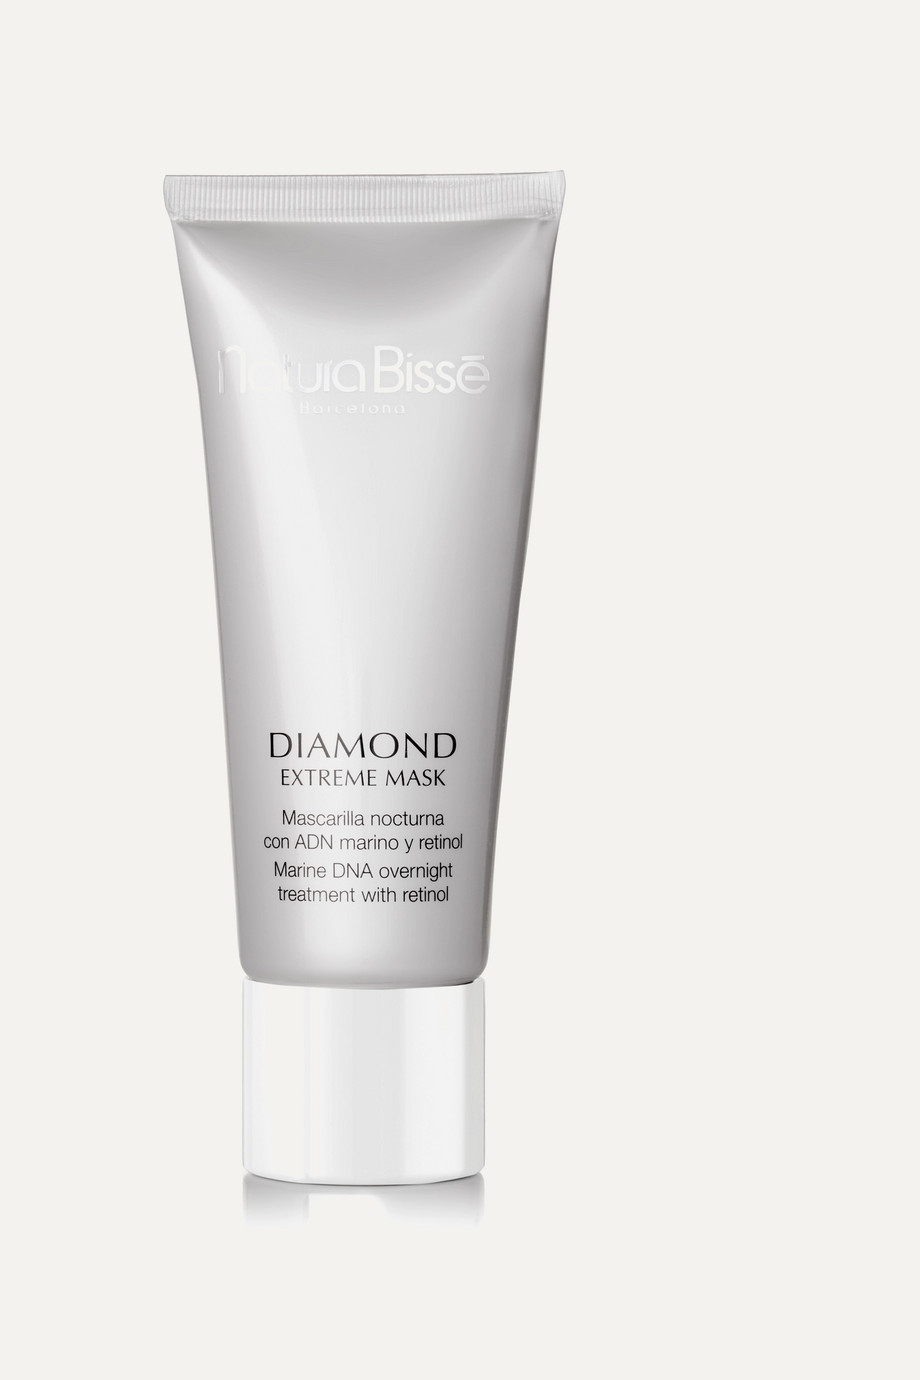 Natura Bissé Diamond Extreme Mask, 75ml